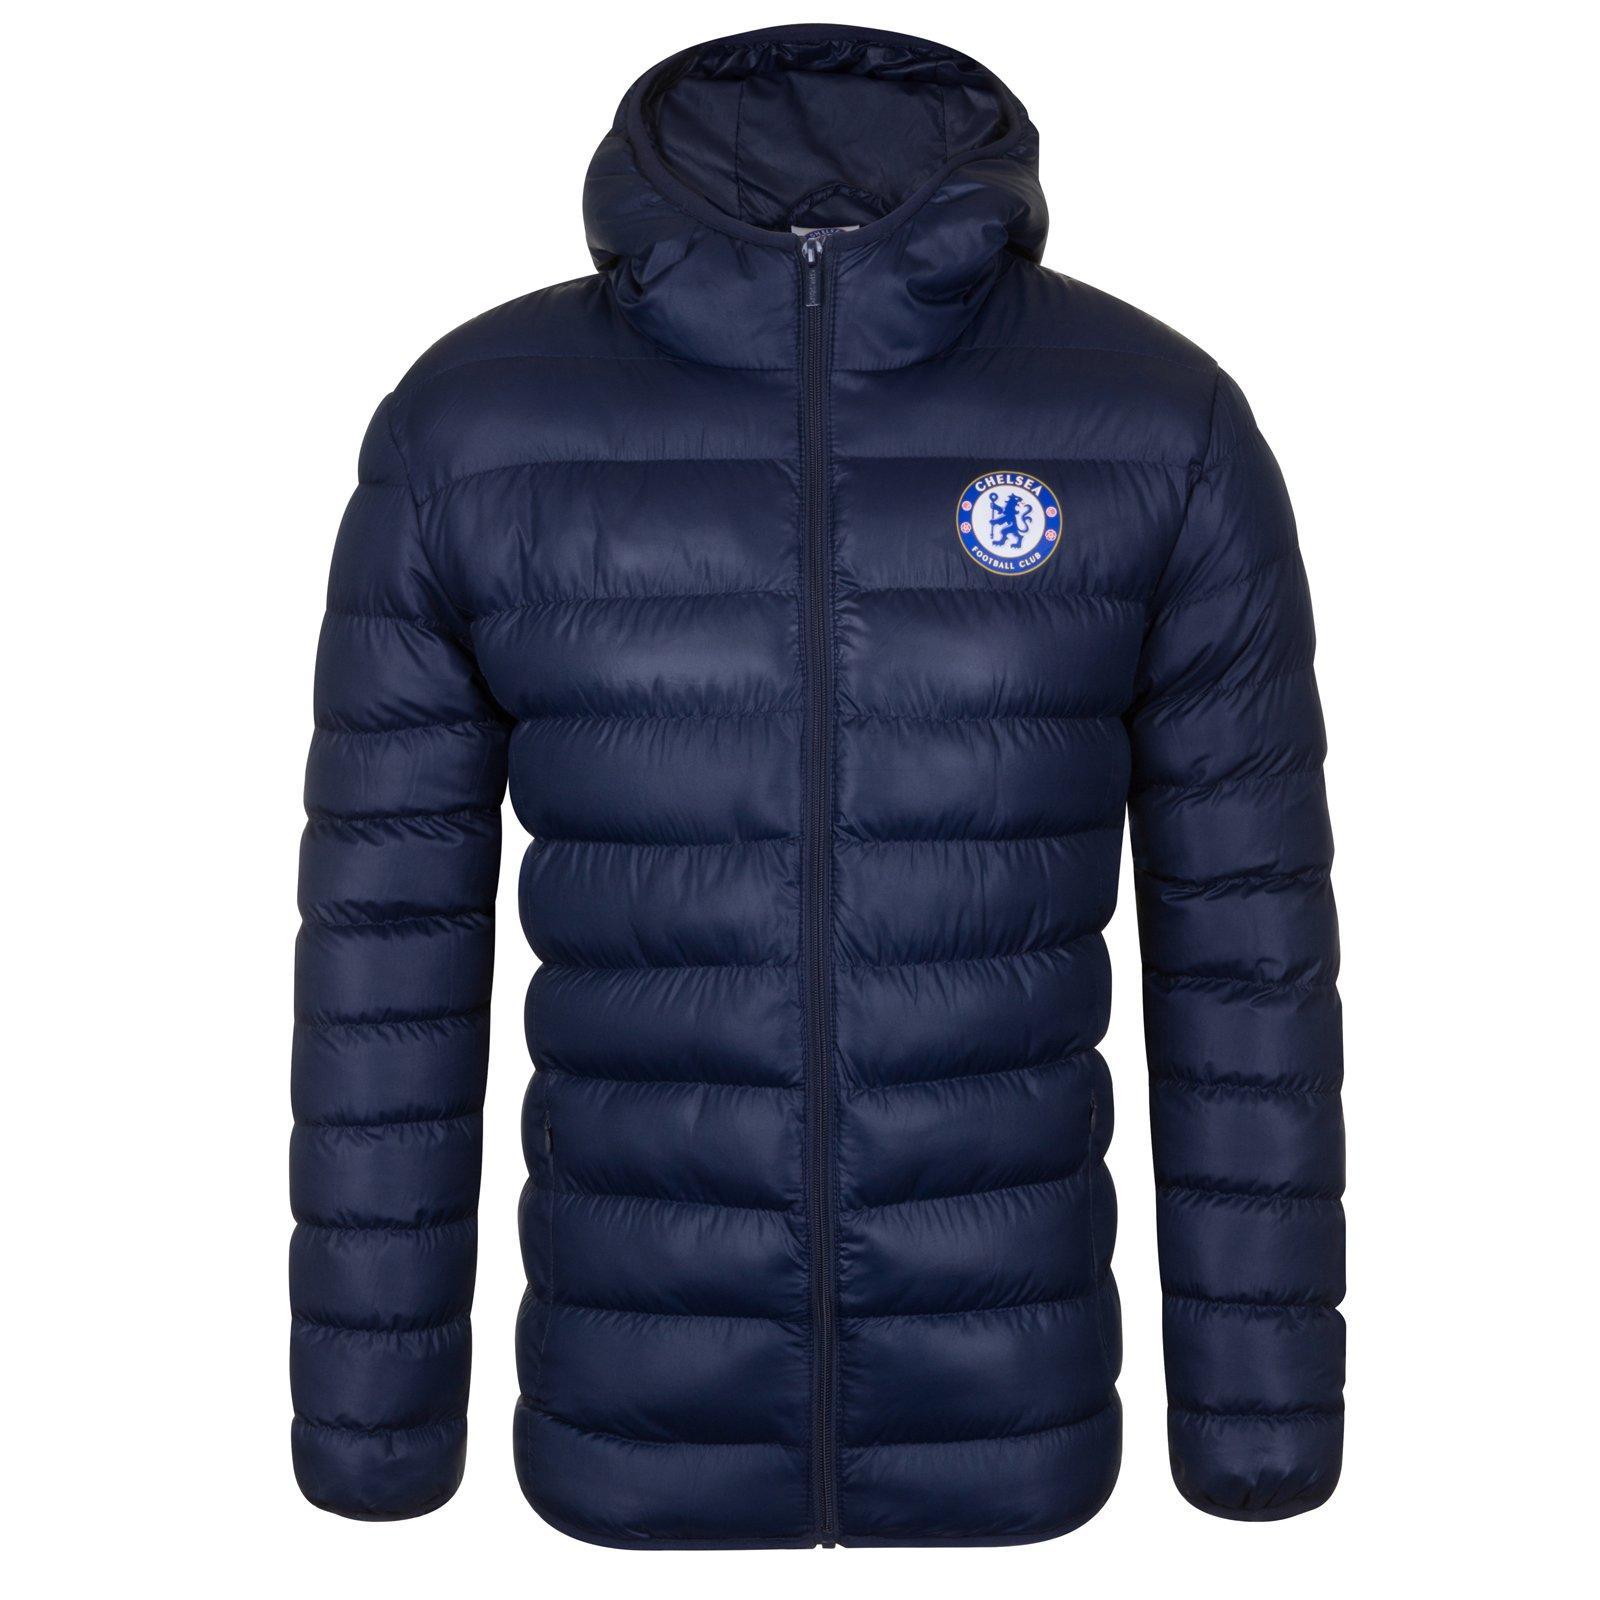 Chelsea FC Official Soccer Gift Boys Fleece Dressing Gown Robe Royal 11-12 Yrs